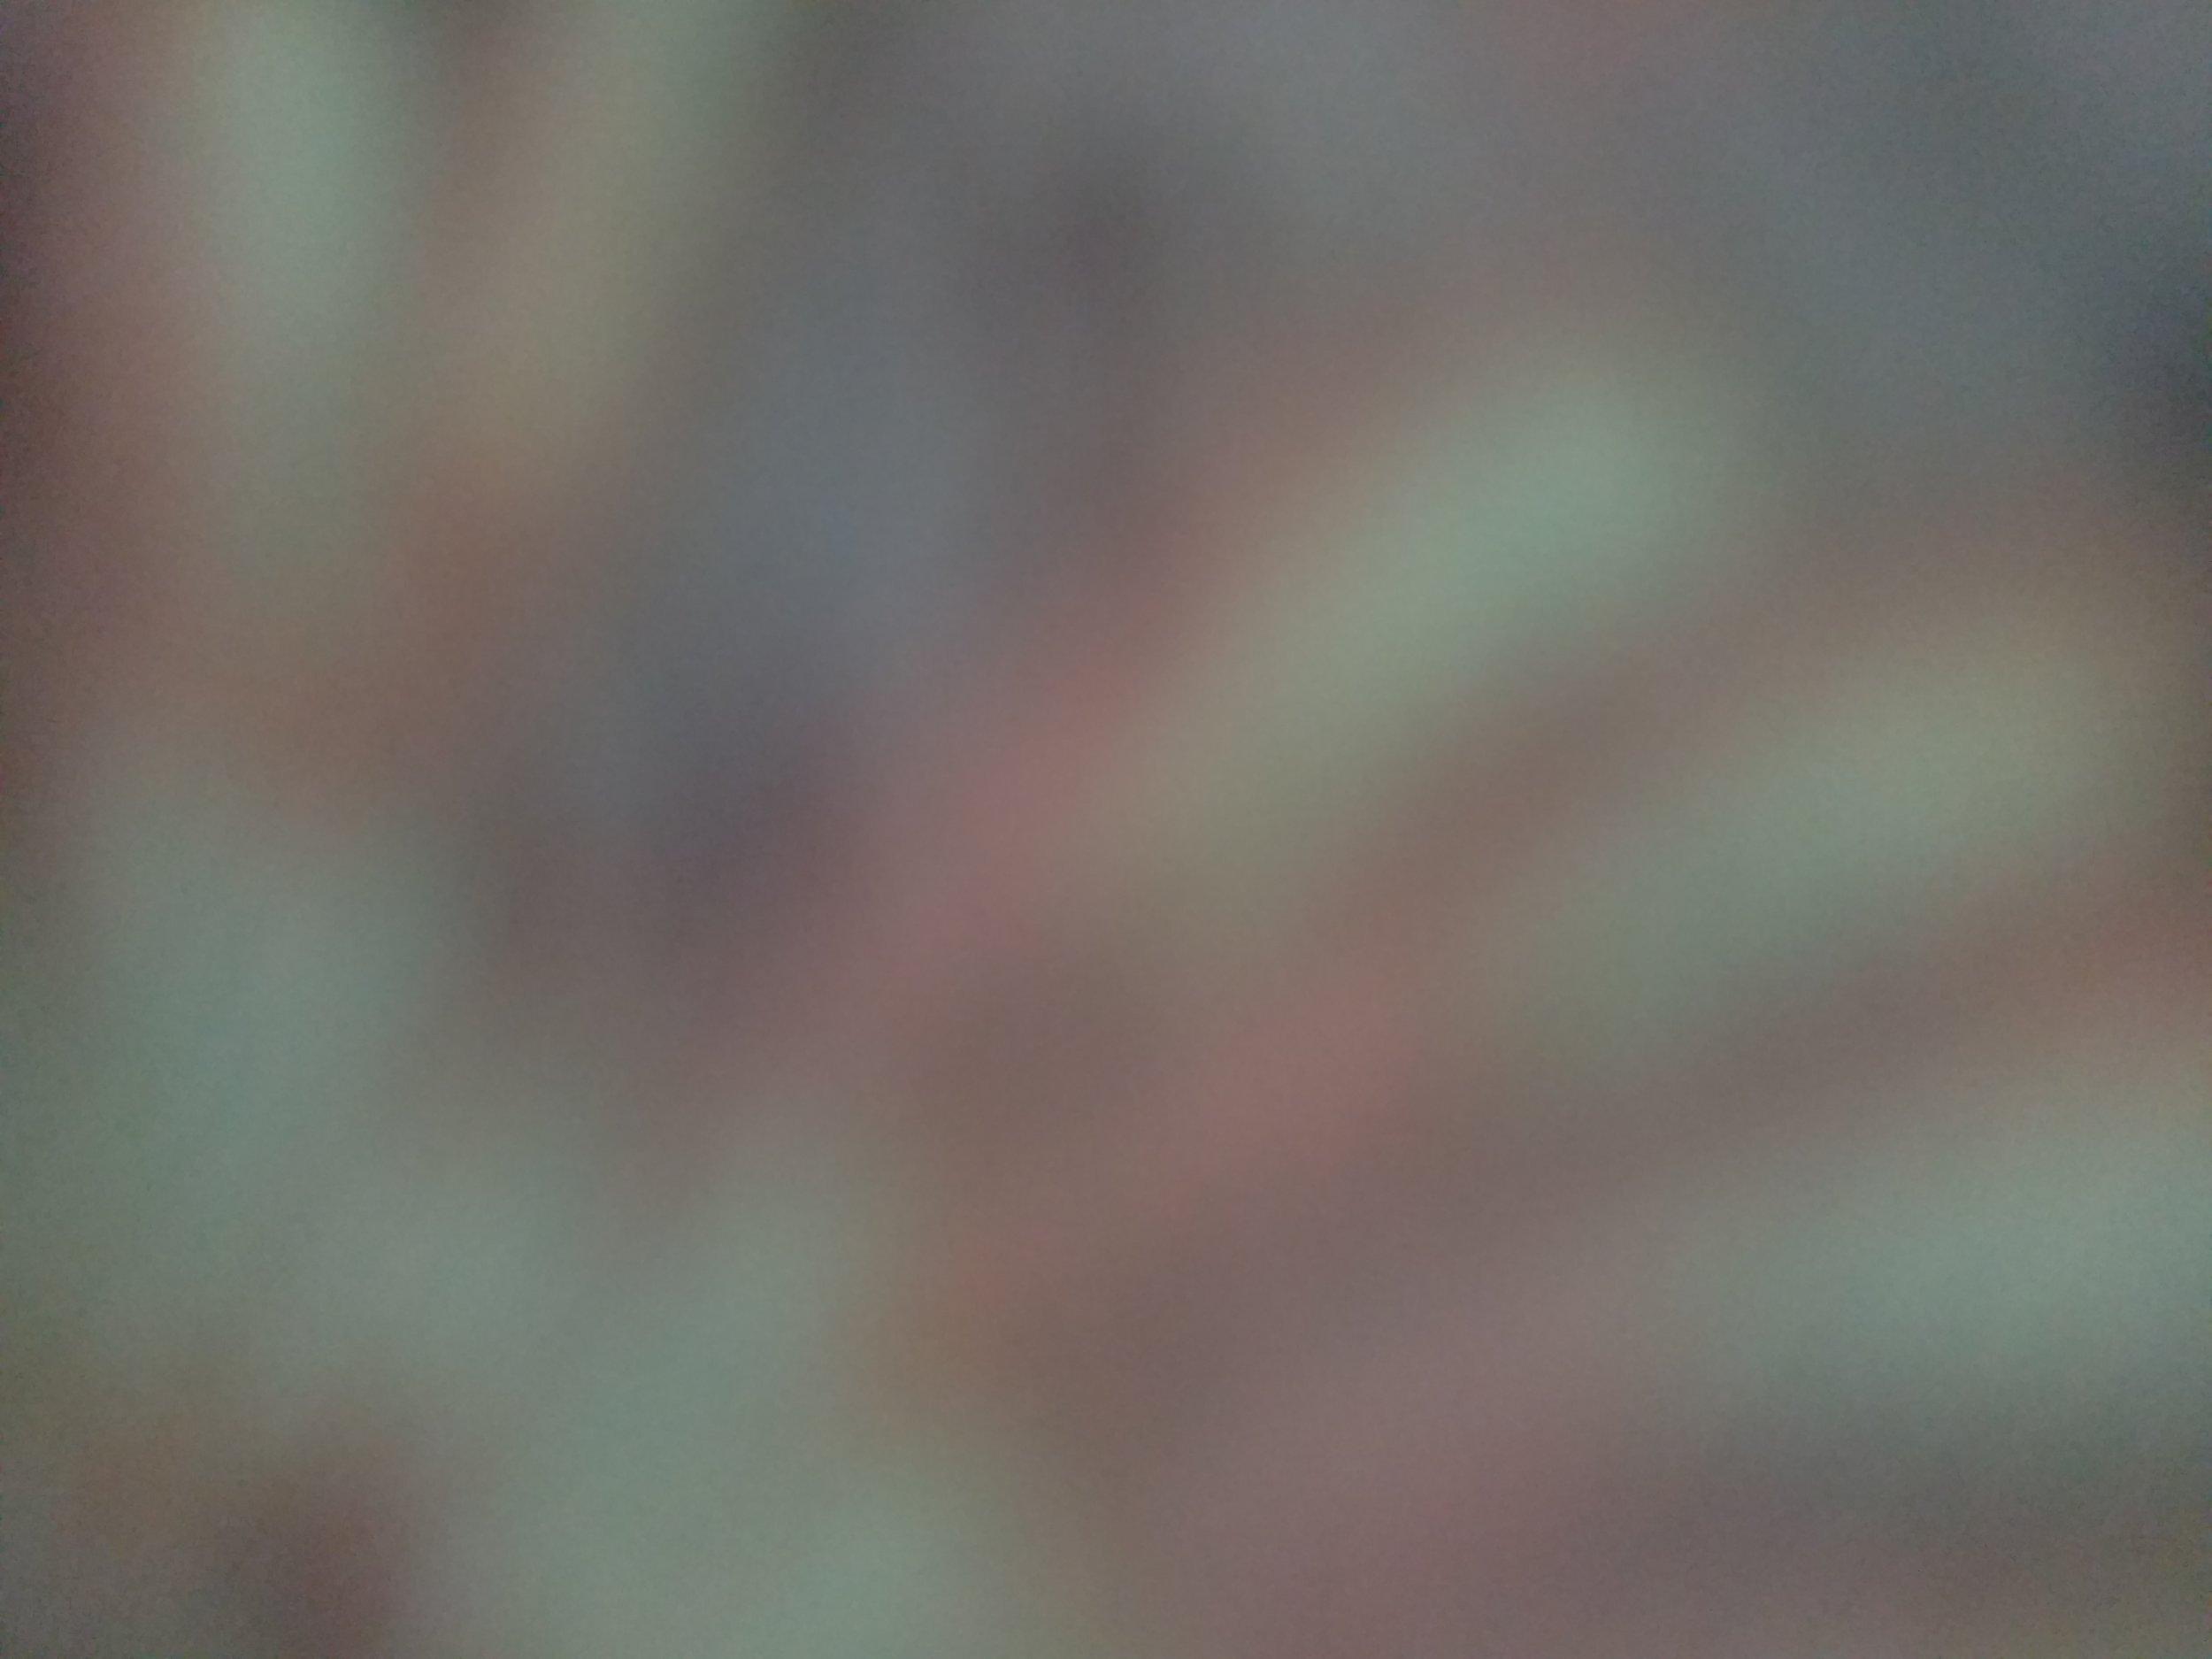 willroth-co-free-texture-gradient-074.jpg